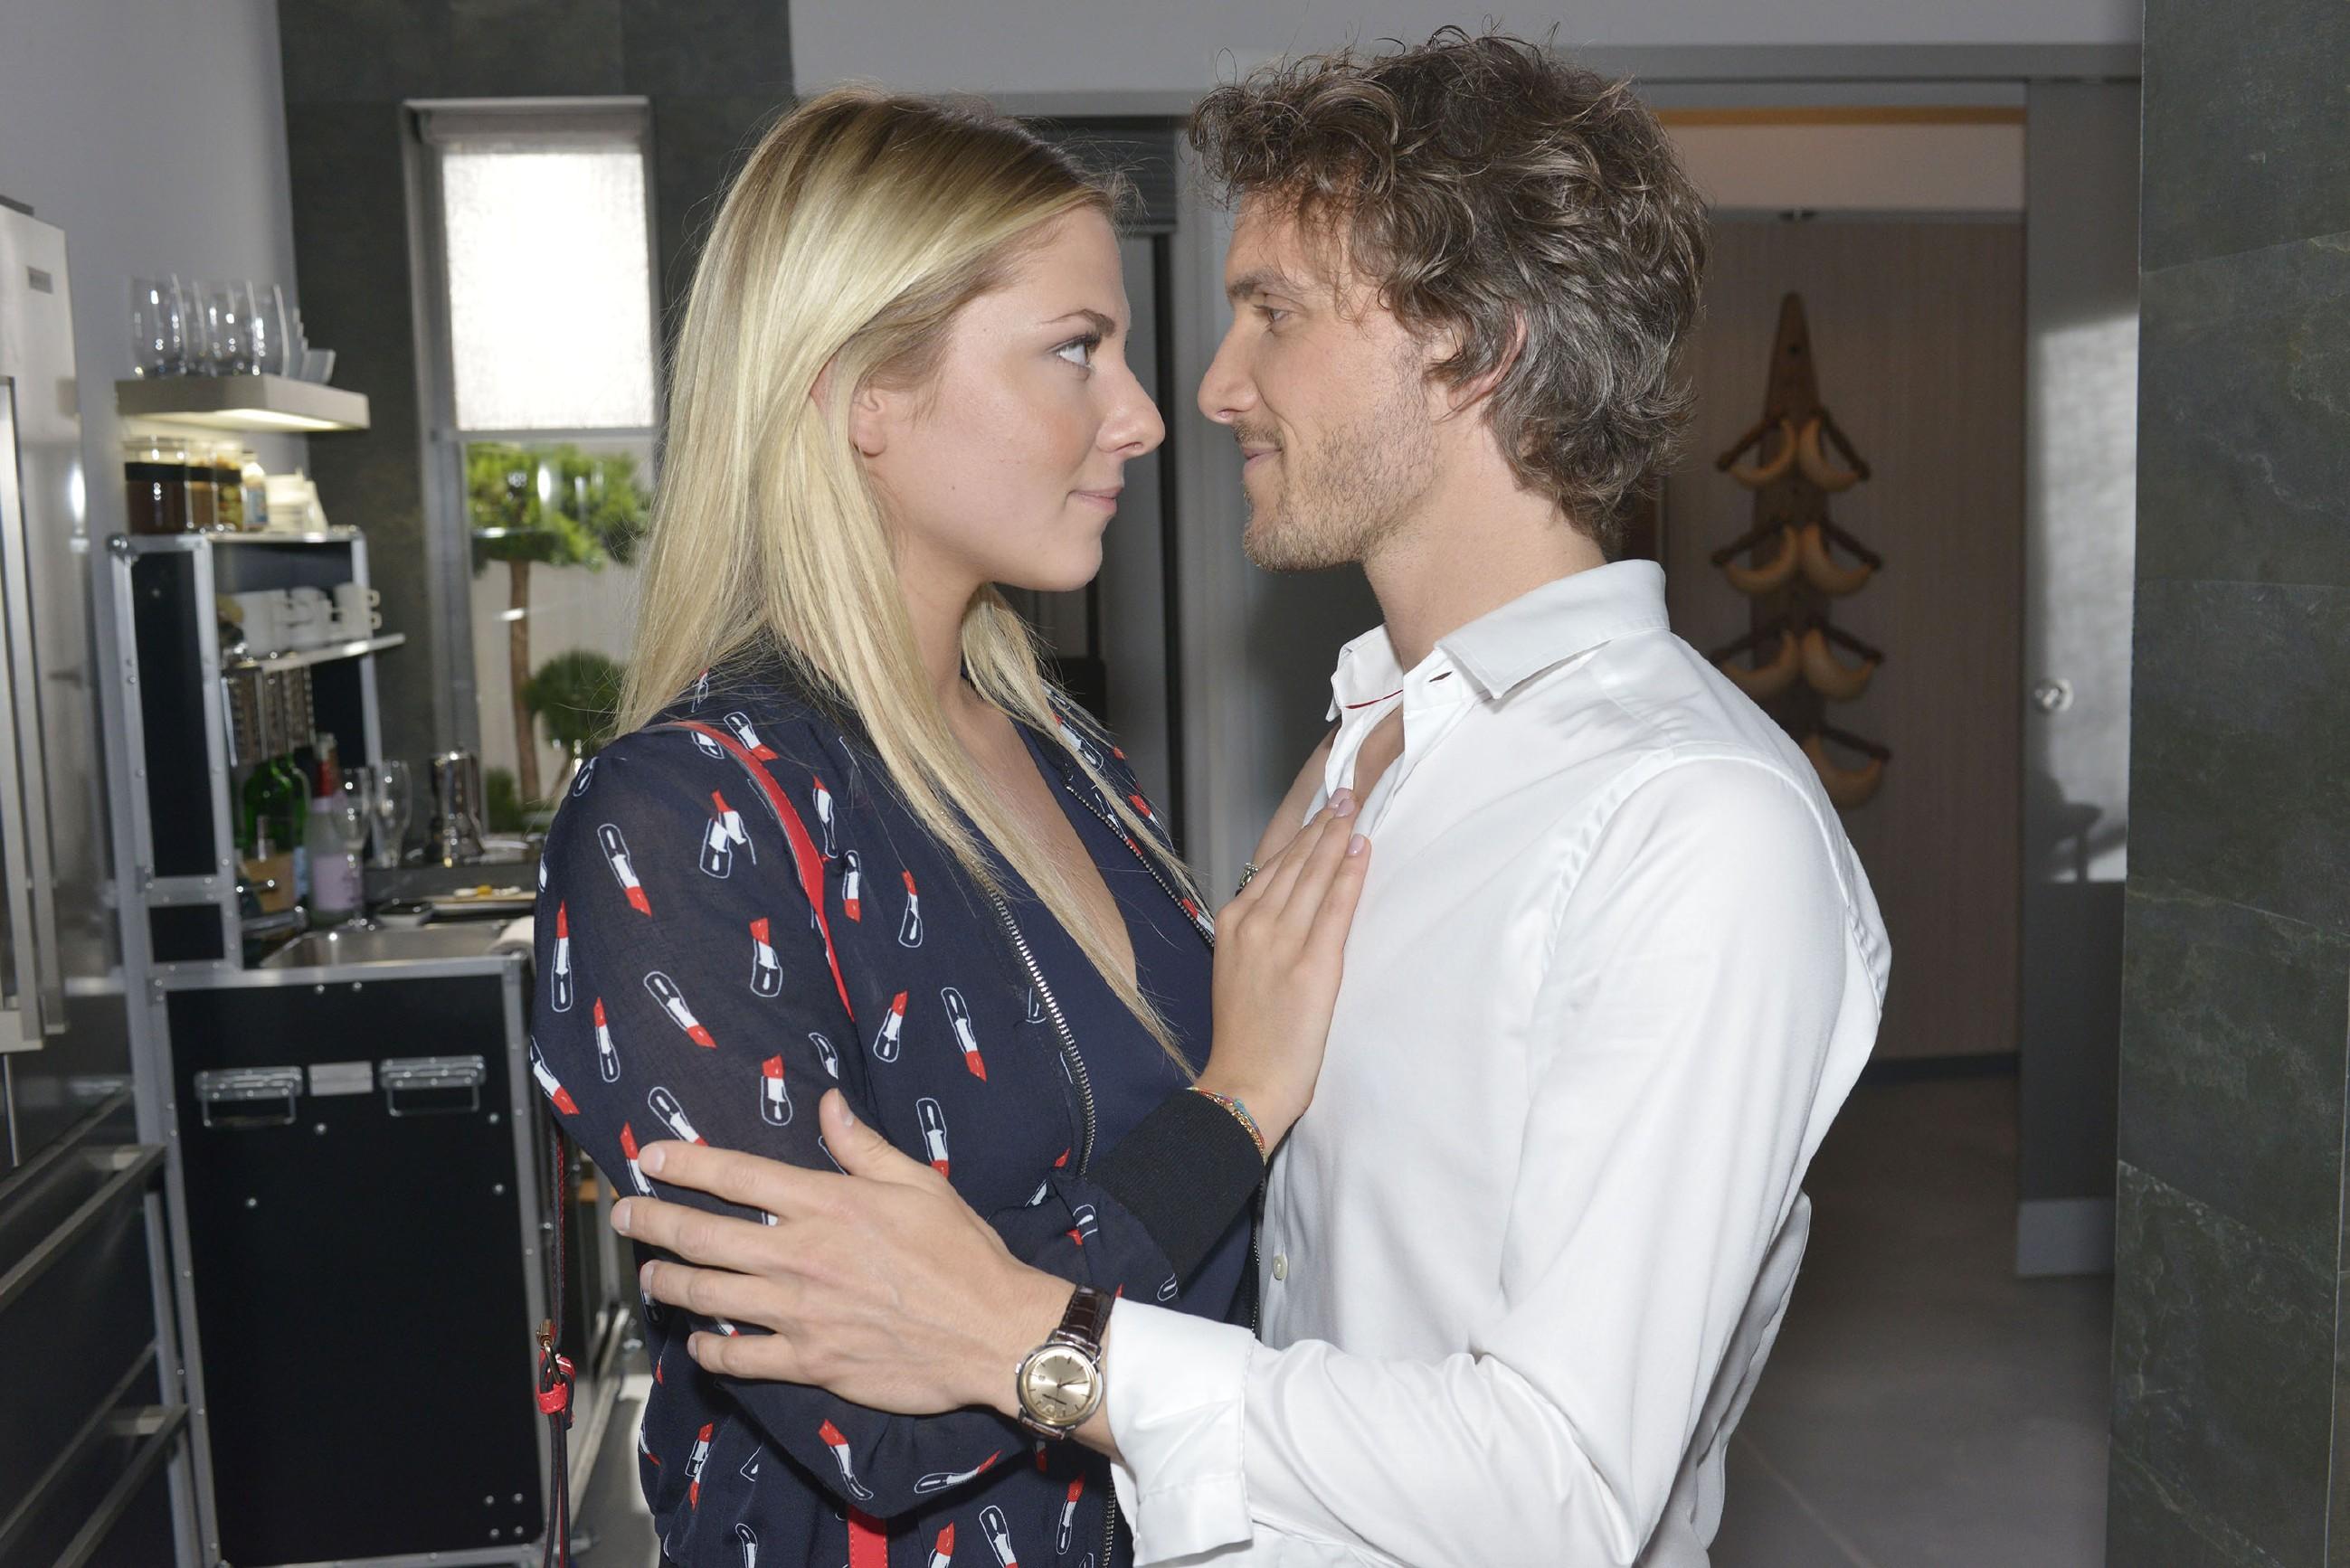 Sunny (Valentina Pahde) und Felix (Thaddäus Meilinger) nähern sich erneut an... (Quelle: RTL / Rolf Baumgartner)